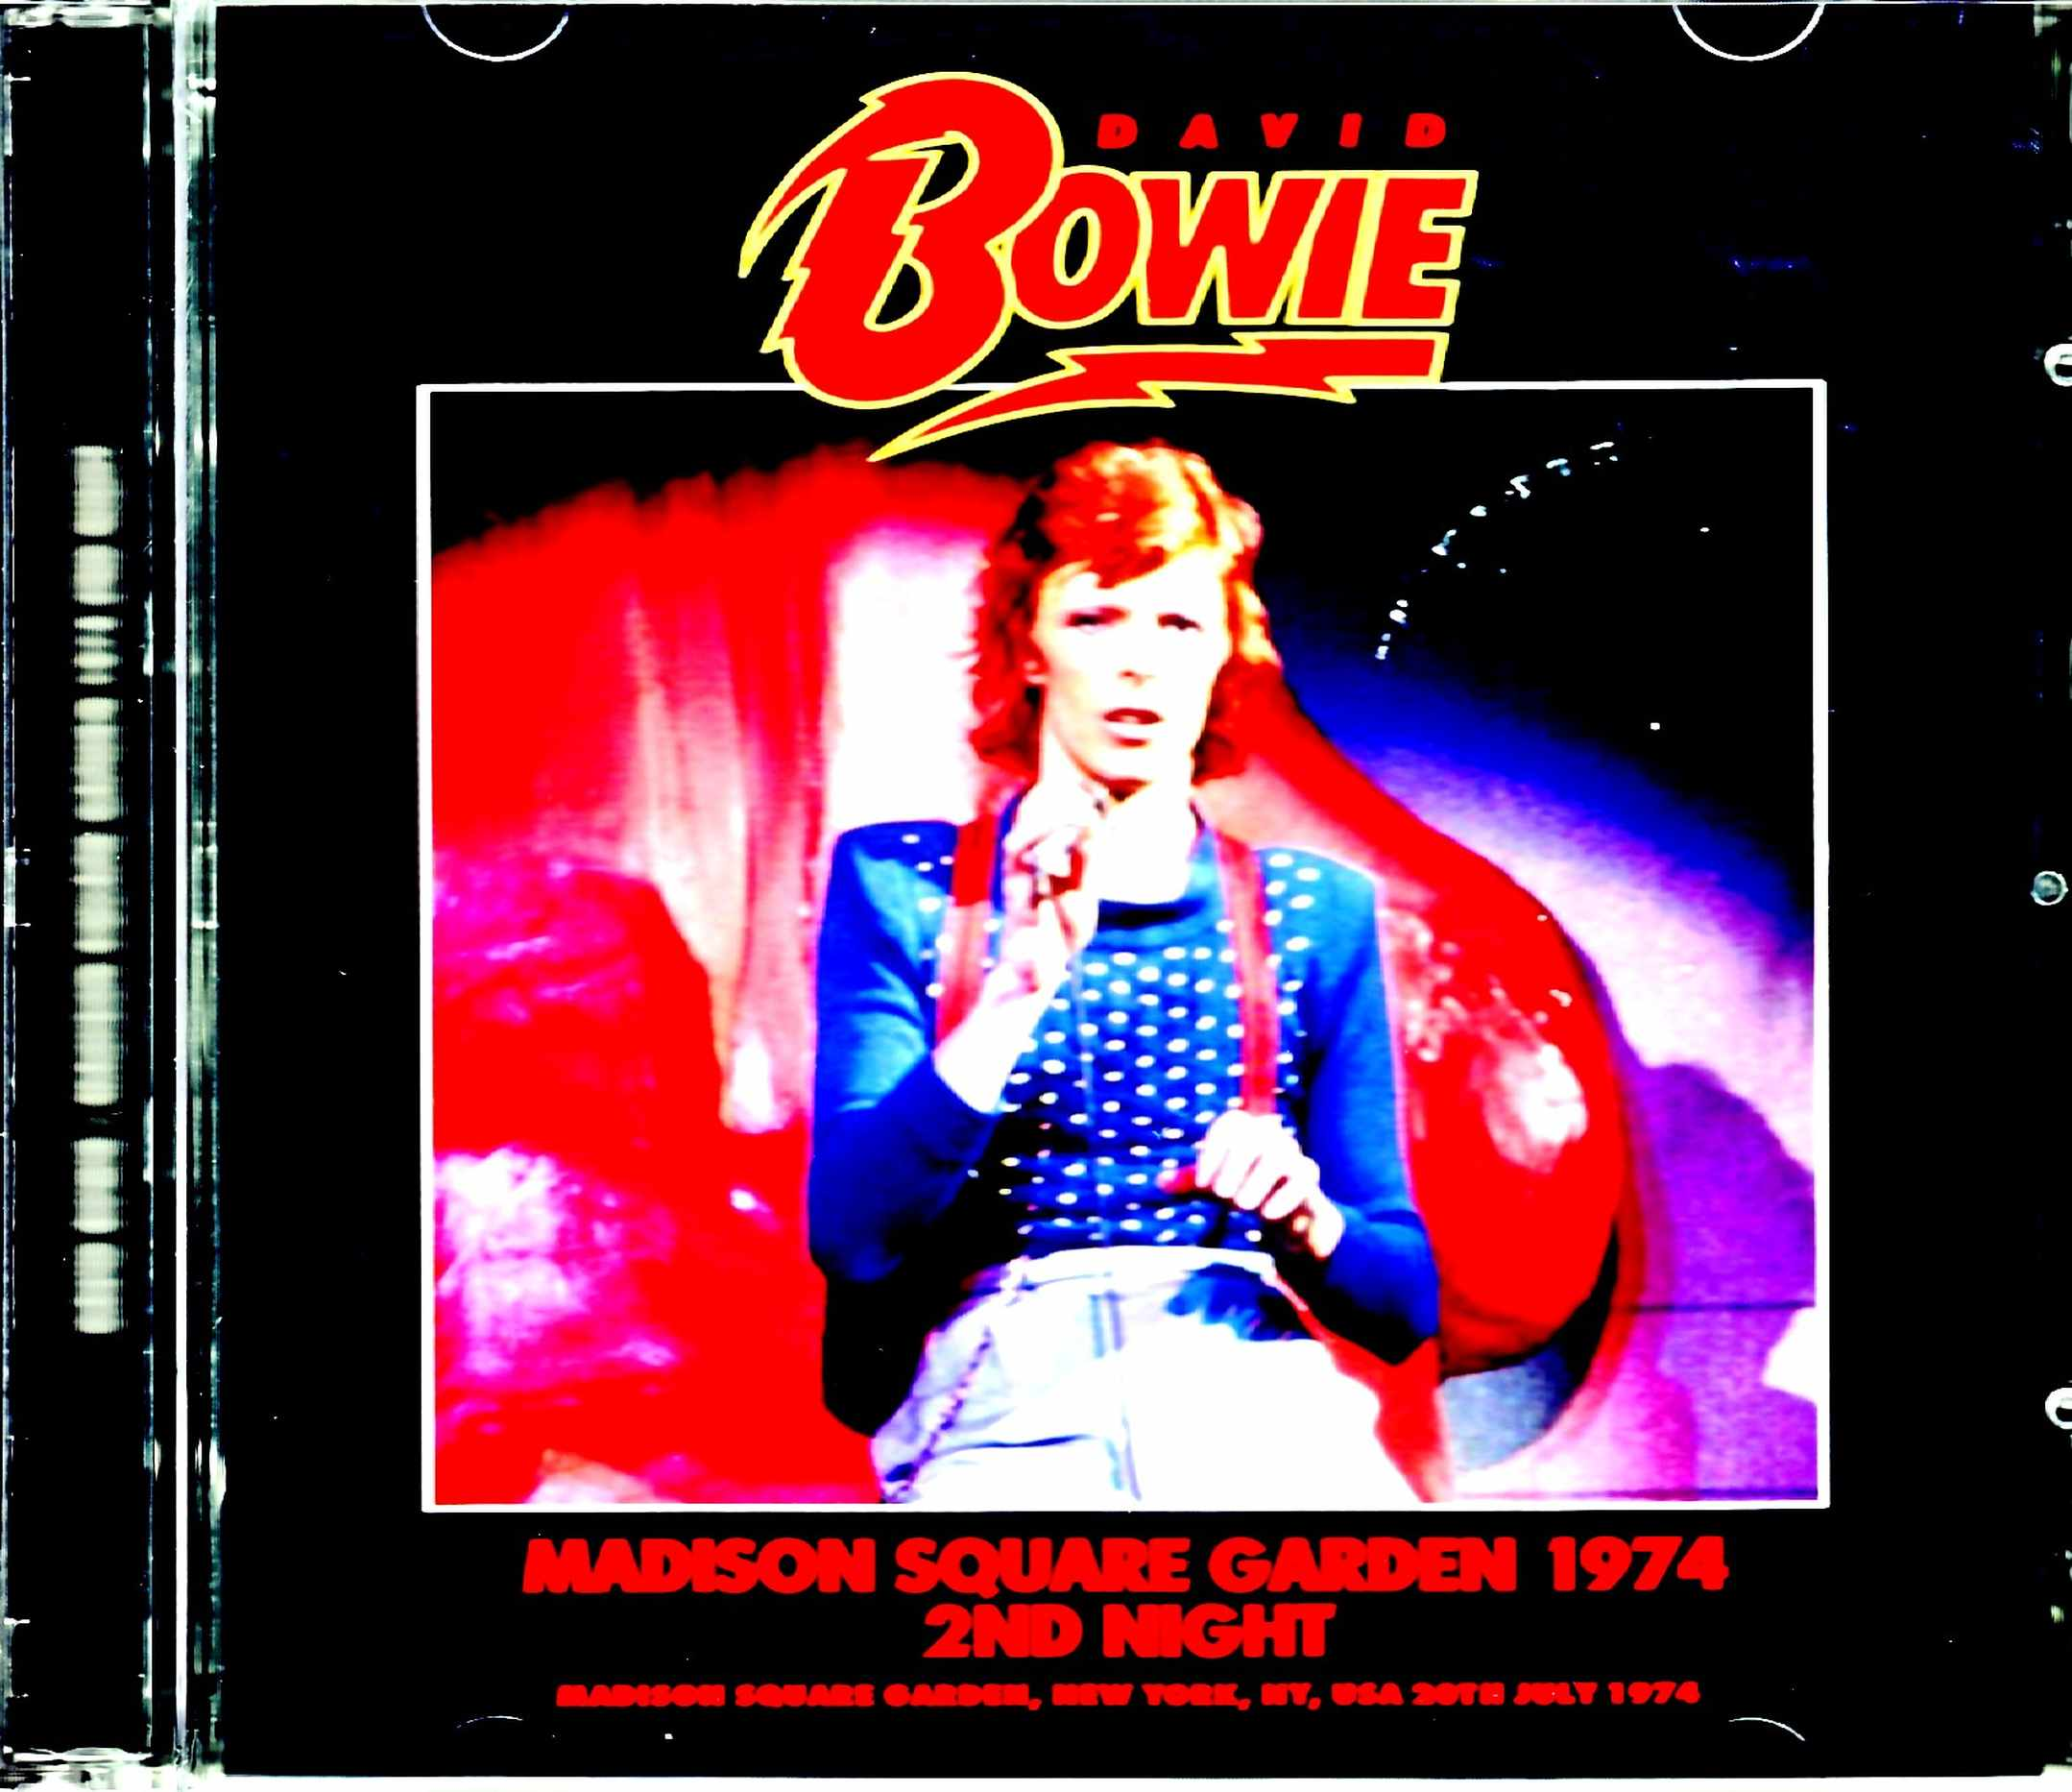 David Bowie デヴィッド・ボウイ/NY,USA 7.20.1974 New Source